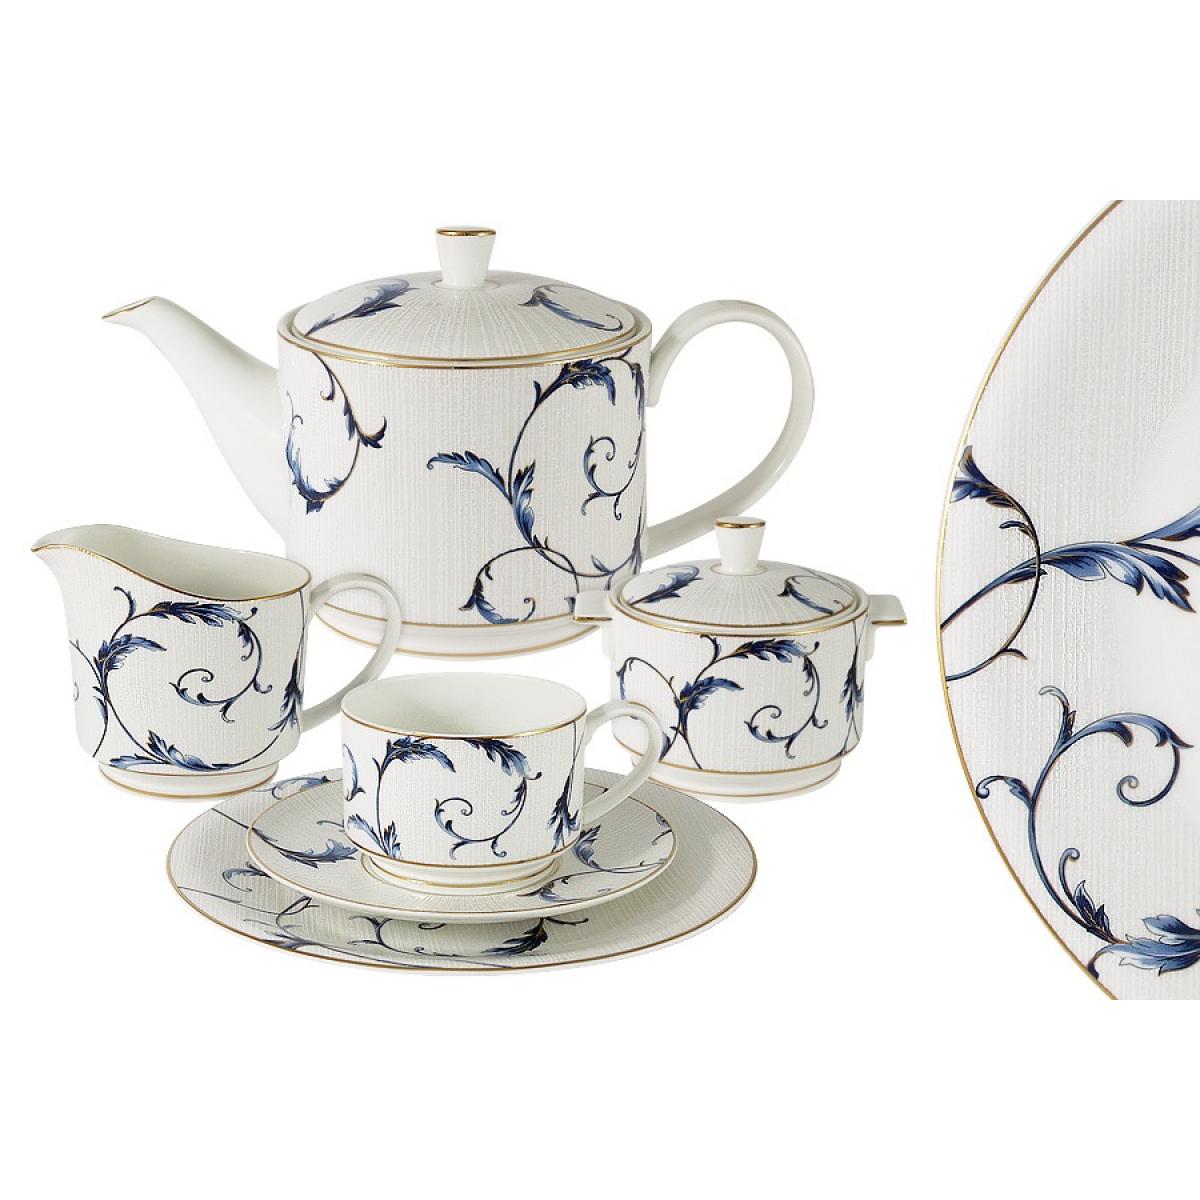 Cервиз чайный элегия 21 предмет на 6 персон Annalafarg rosenthal selection sanssouci elfenbein молочник для 6 персон 0 19 л